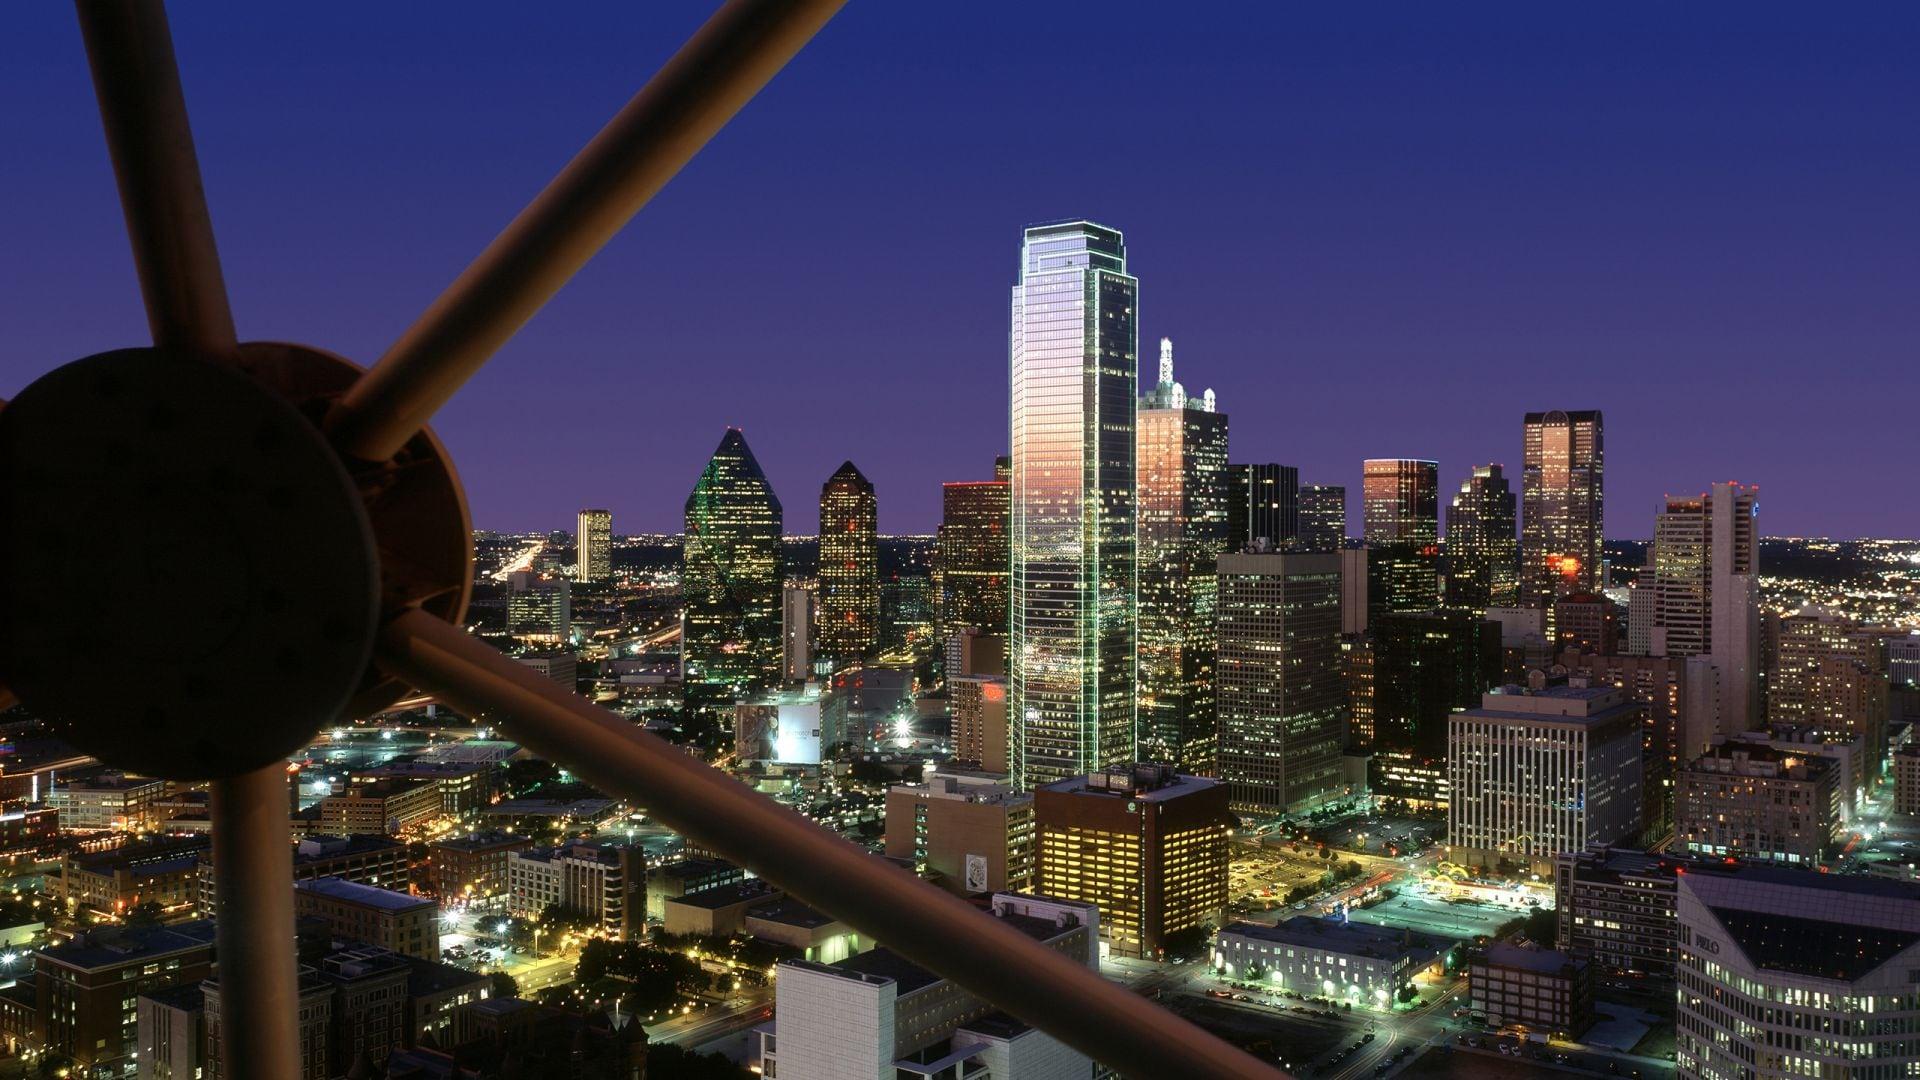 Night View of Skyline from Reunion Tower Hyatt Regency Dallas